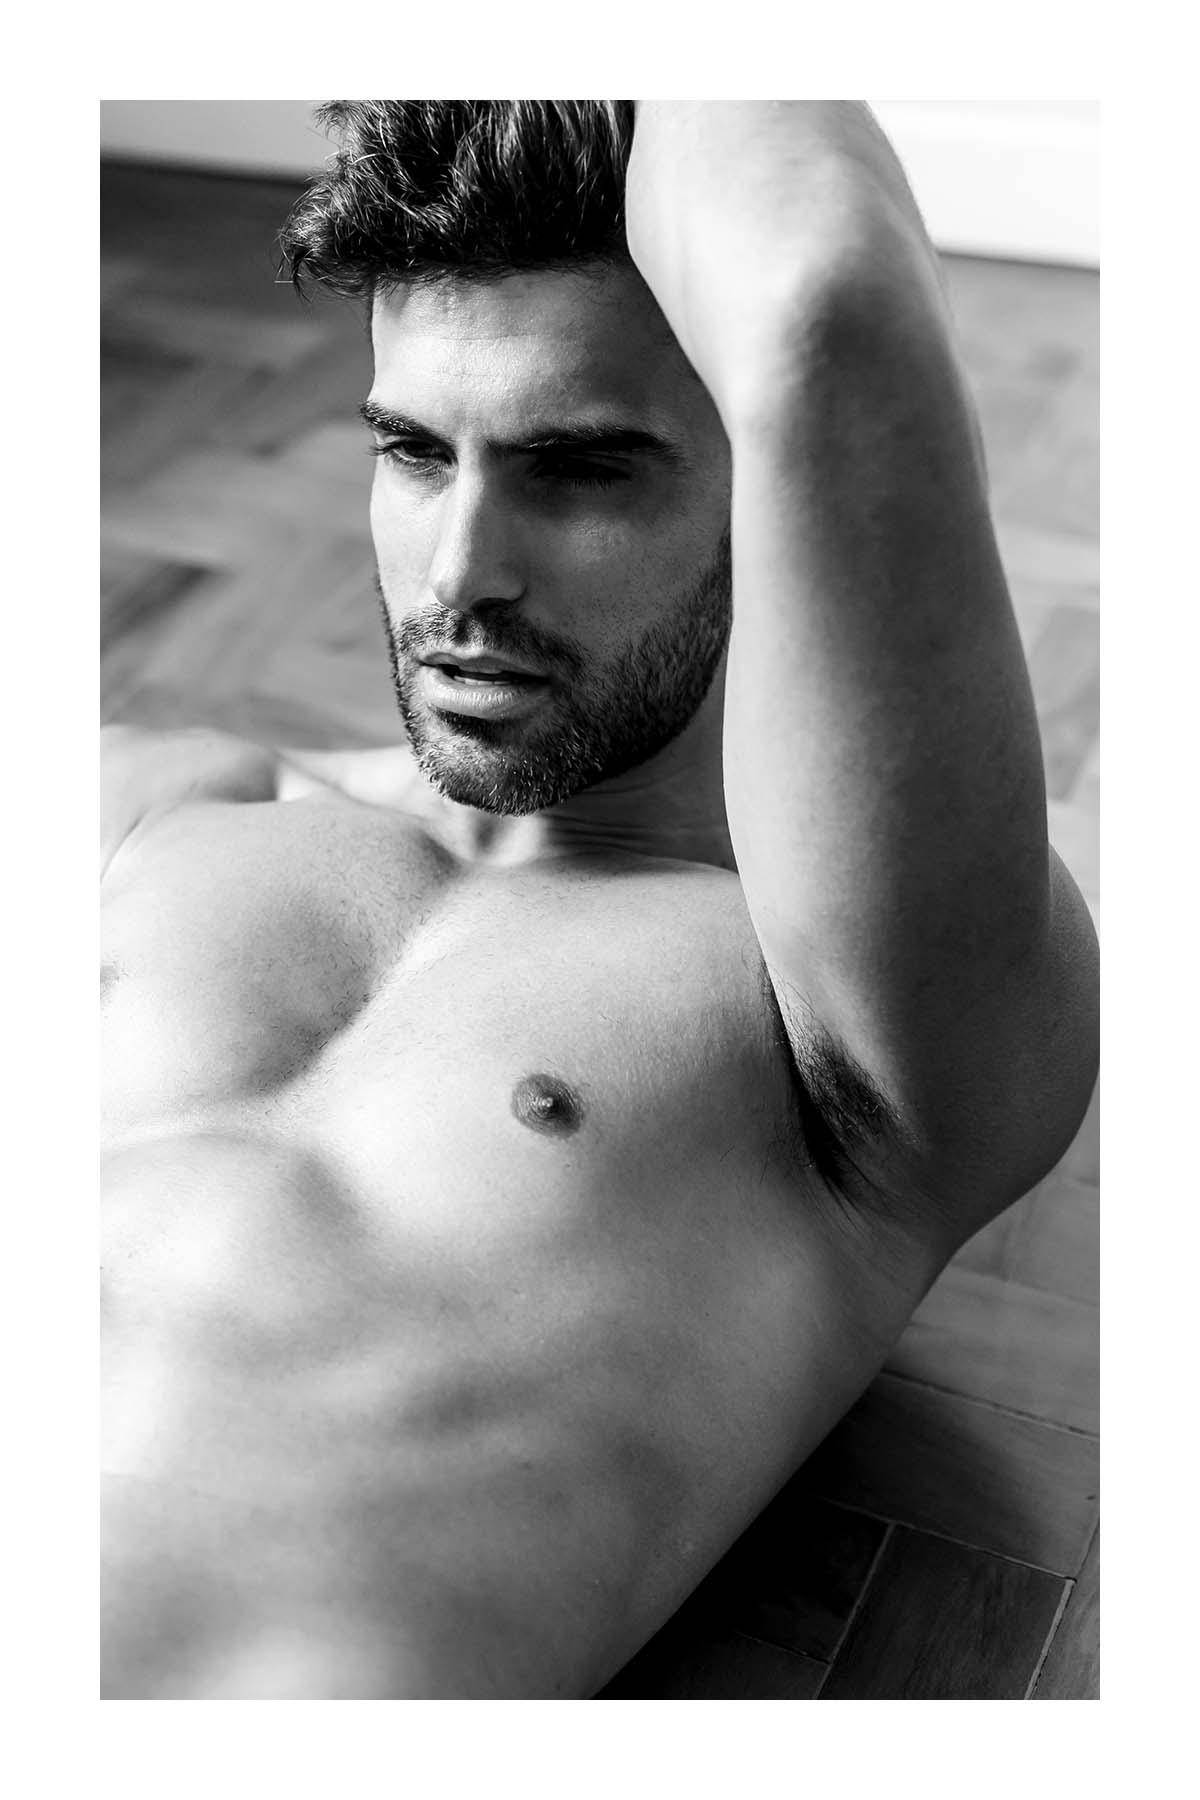 Eduardo Salles by Thiago Martini for Brazilian Male Model